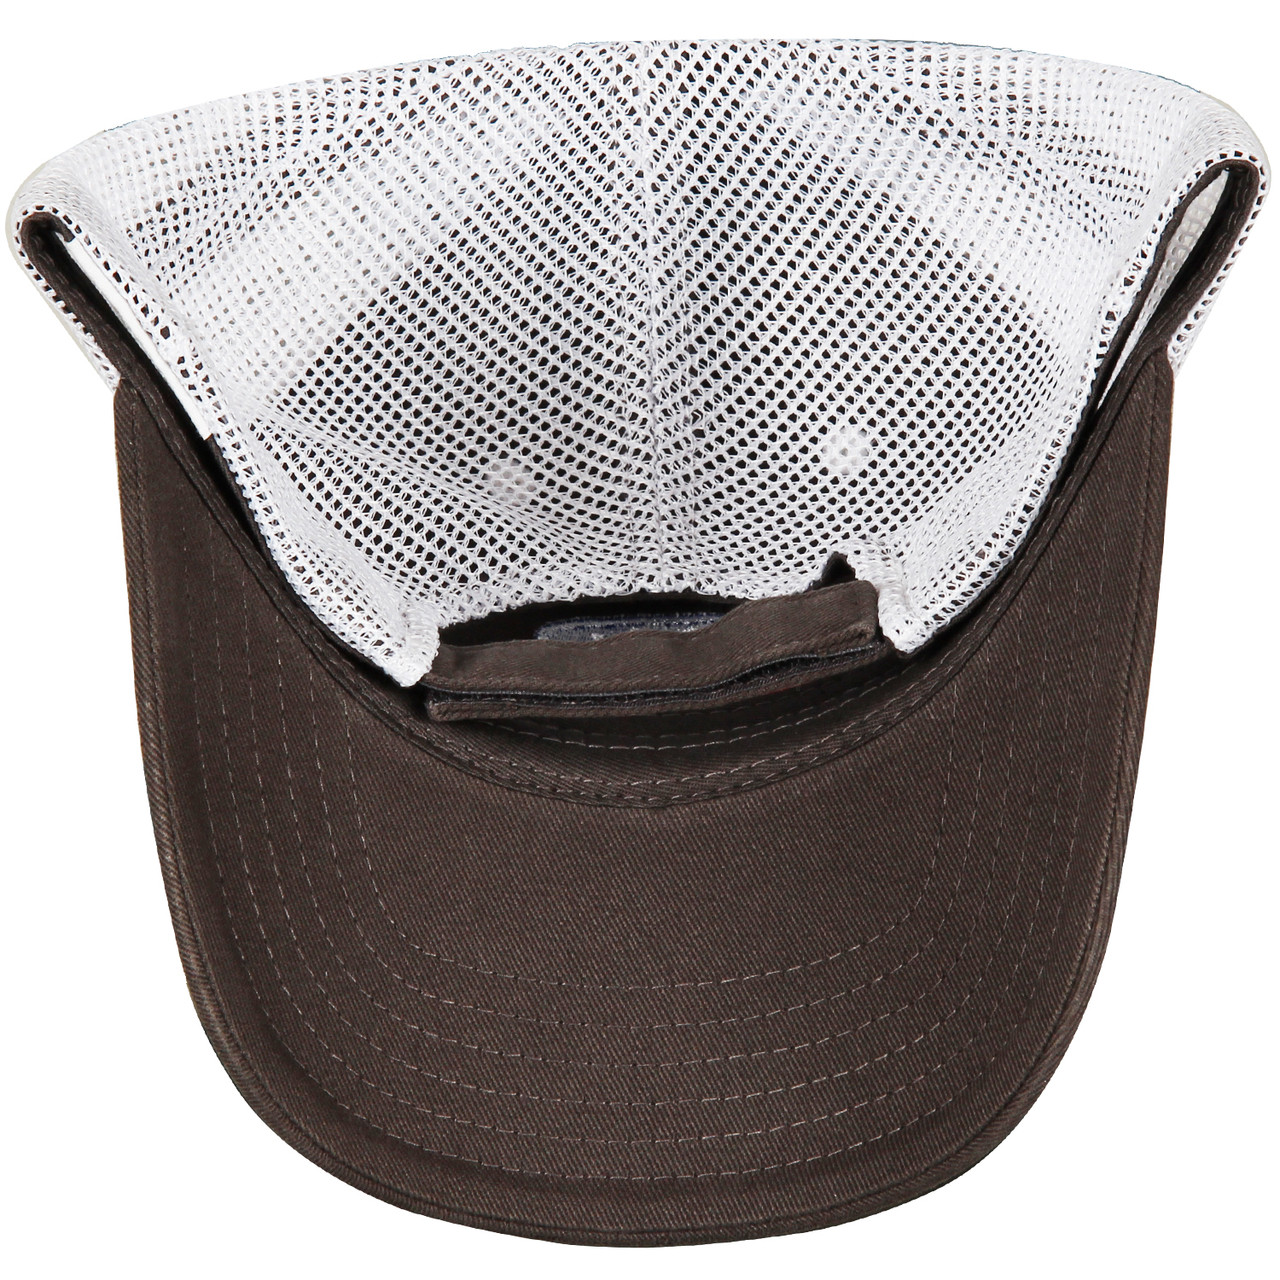 Ford Power Stroke Diesel Gray & White Mesh Hat (under)